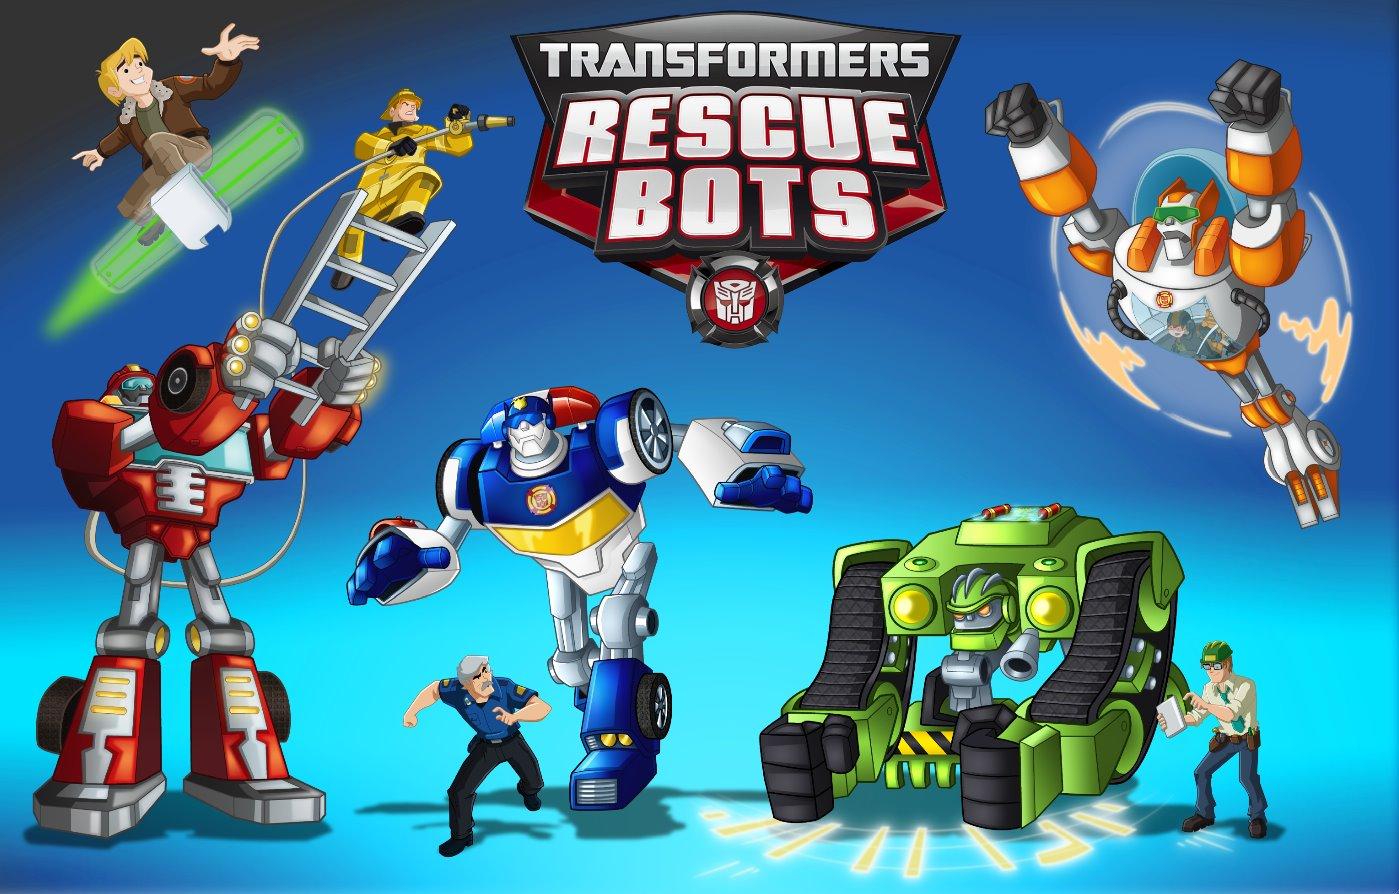 http://3.bp.blogspot.com/-LLesd0yTytQ/TzxTAjI2shI/AAAAAAAAAYs/Z57f6g0zKxc/s1600/Transformers-Rescue-Bots_1322700812.jpg